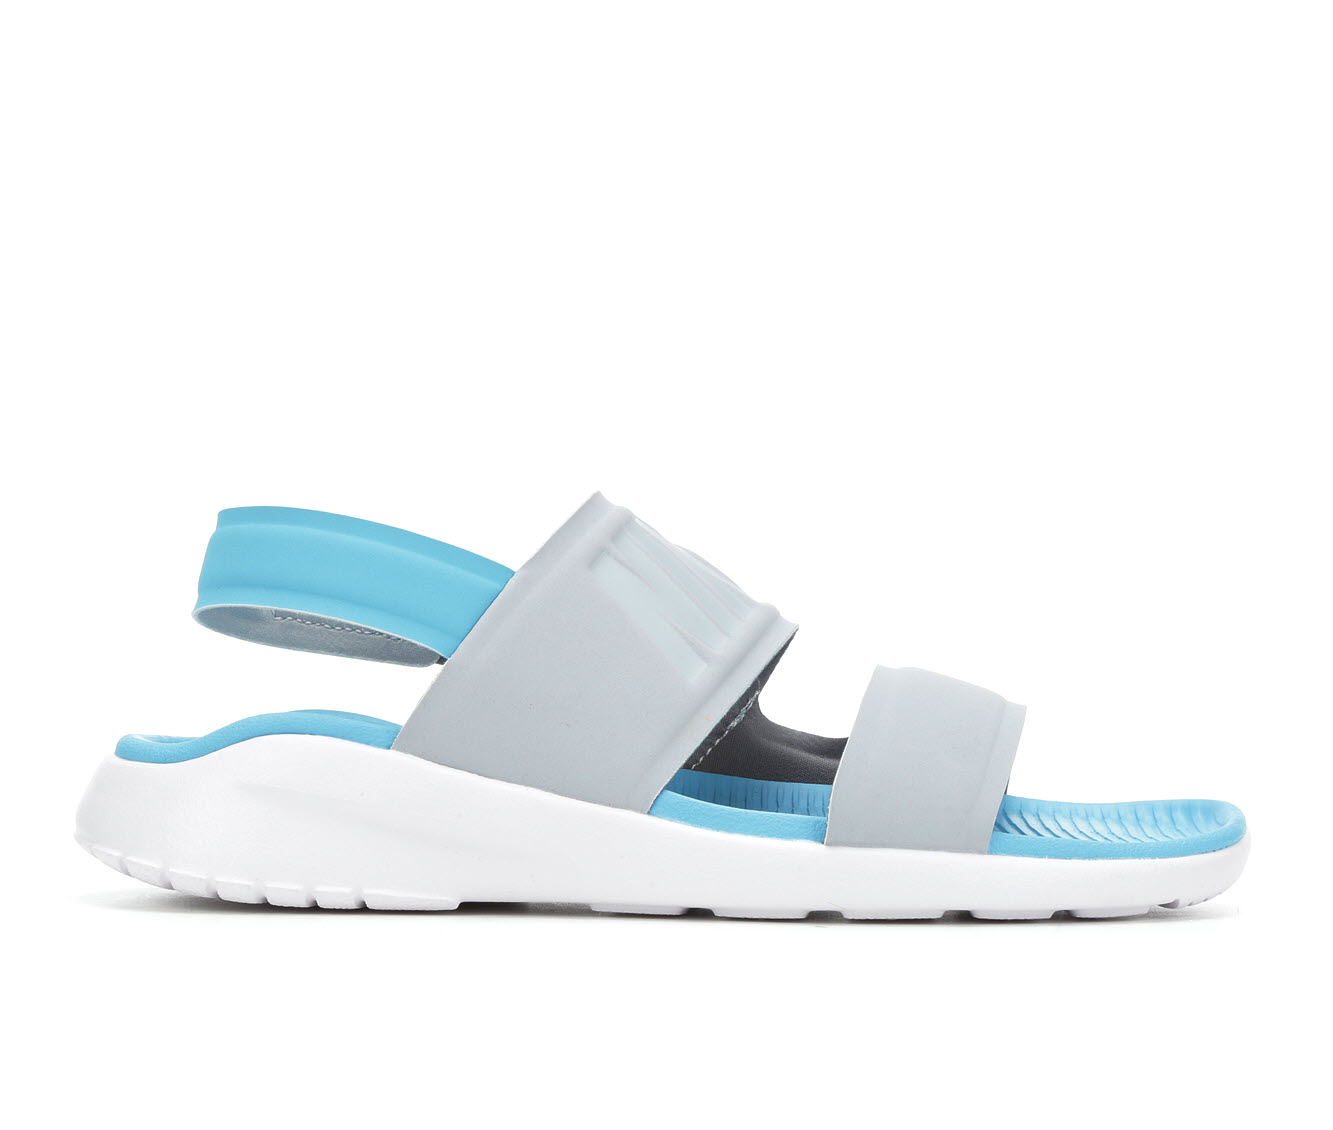 Nike Nike Tanjun Sandal Women's Shoe